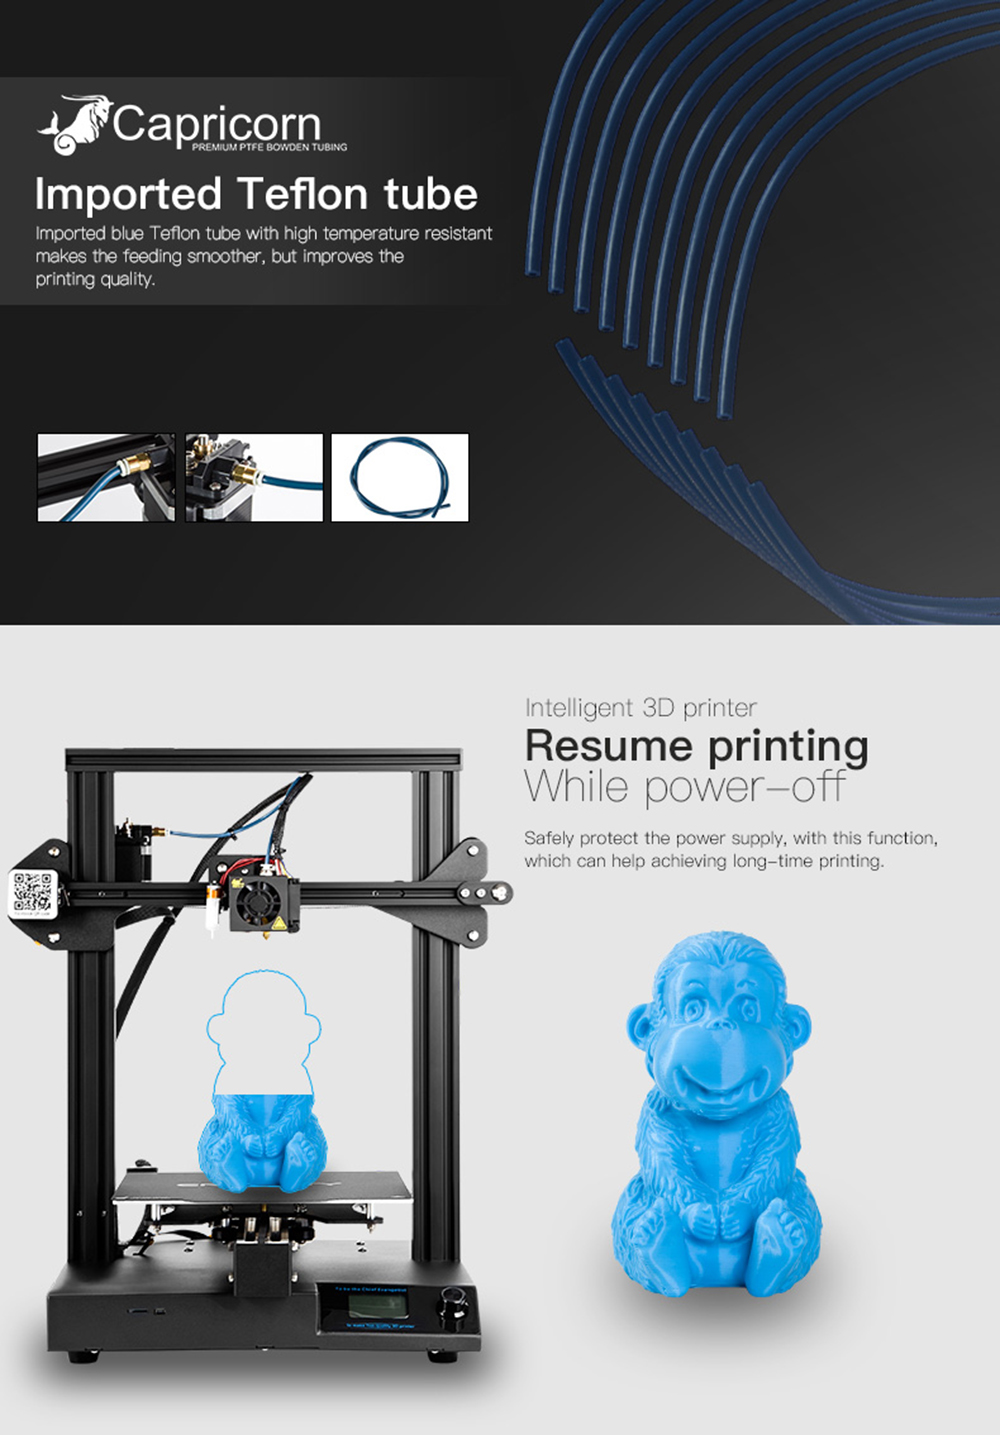 Creality3D CR-20 Pro 3D-Drucker Bausatz - 220x220x250mm - Blauer Capricorn Teflonschlauch - Resume Printing Funktion